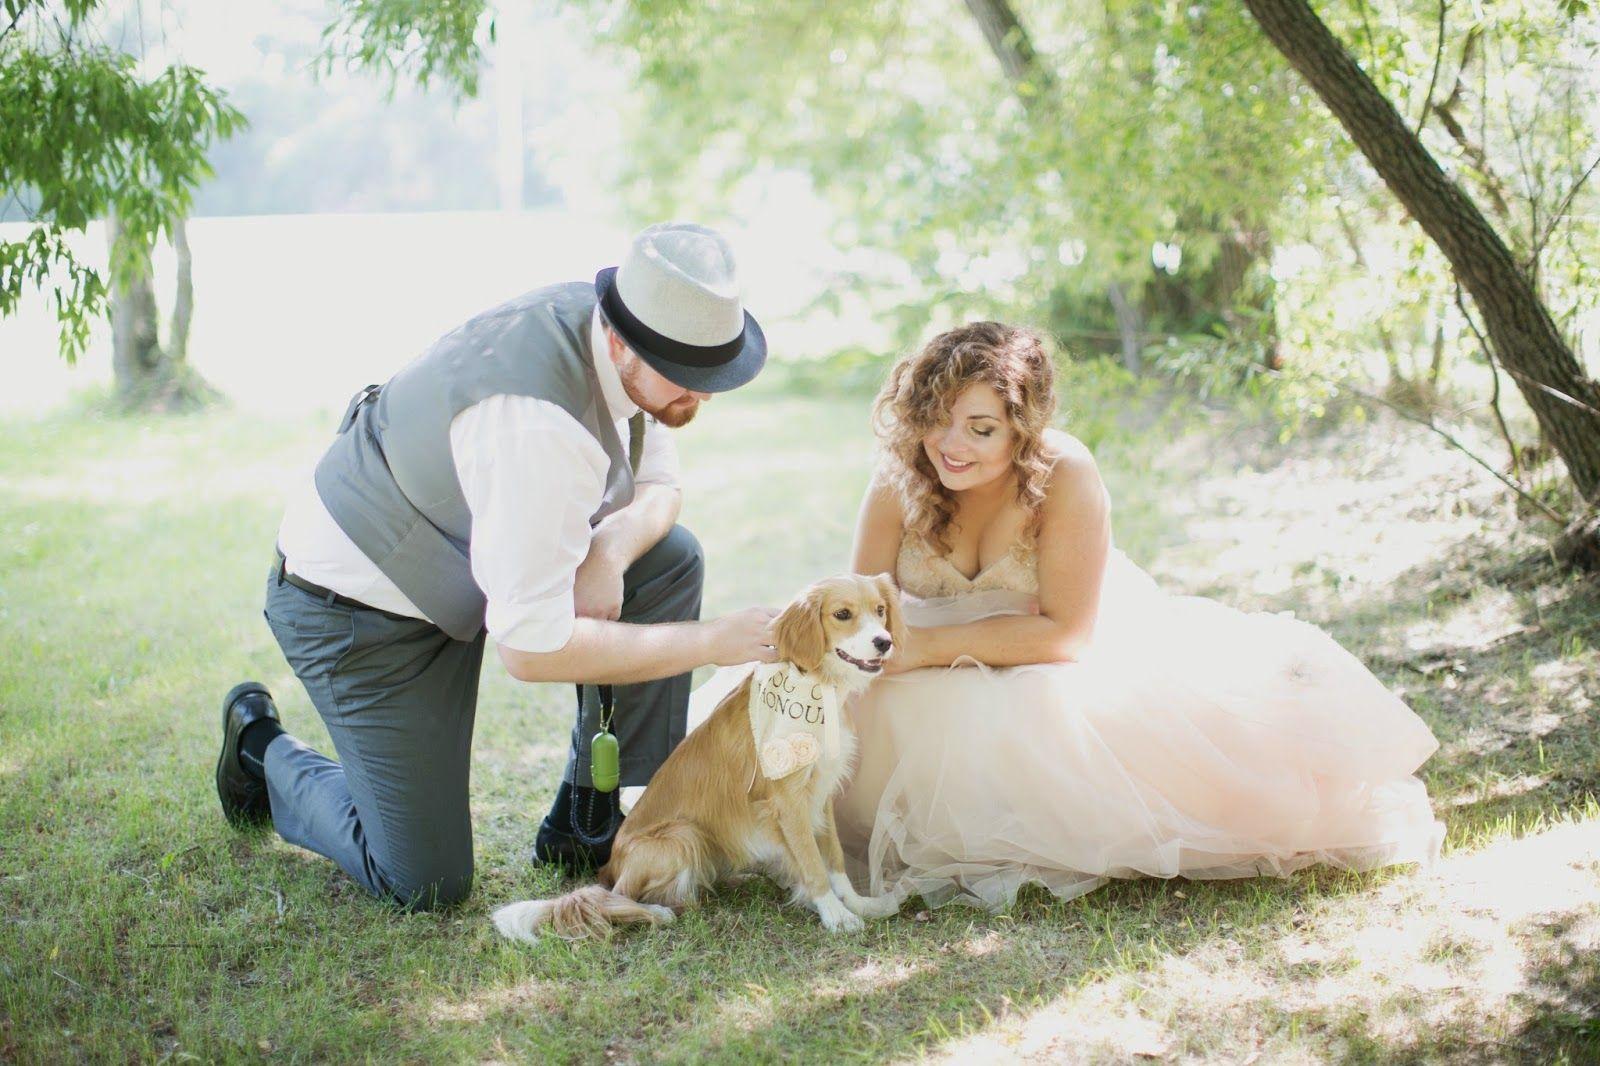 Light A Candle: Being Thankful #wedding #weddingdogs #bestdog #dogofhonour #dogofhonor